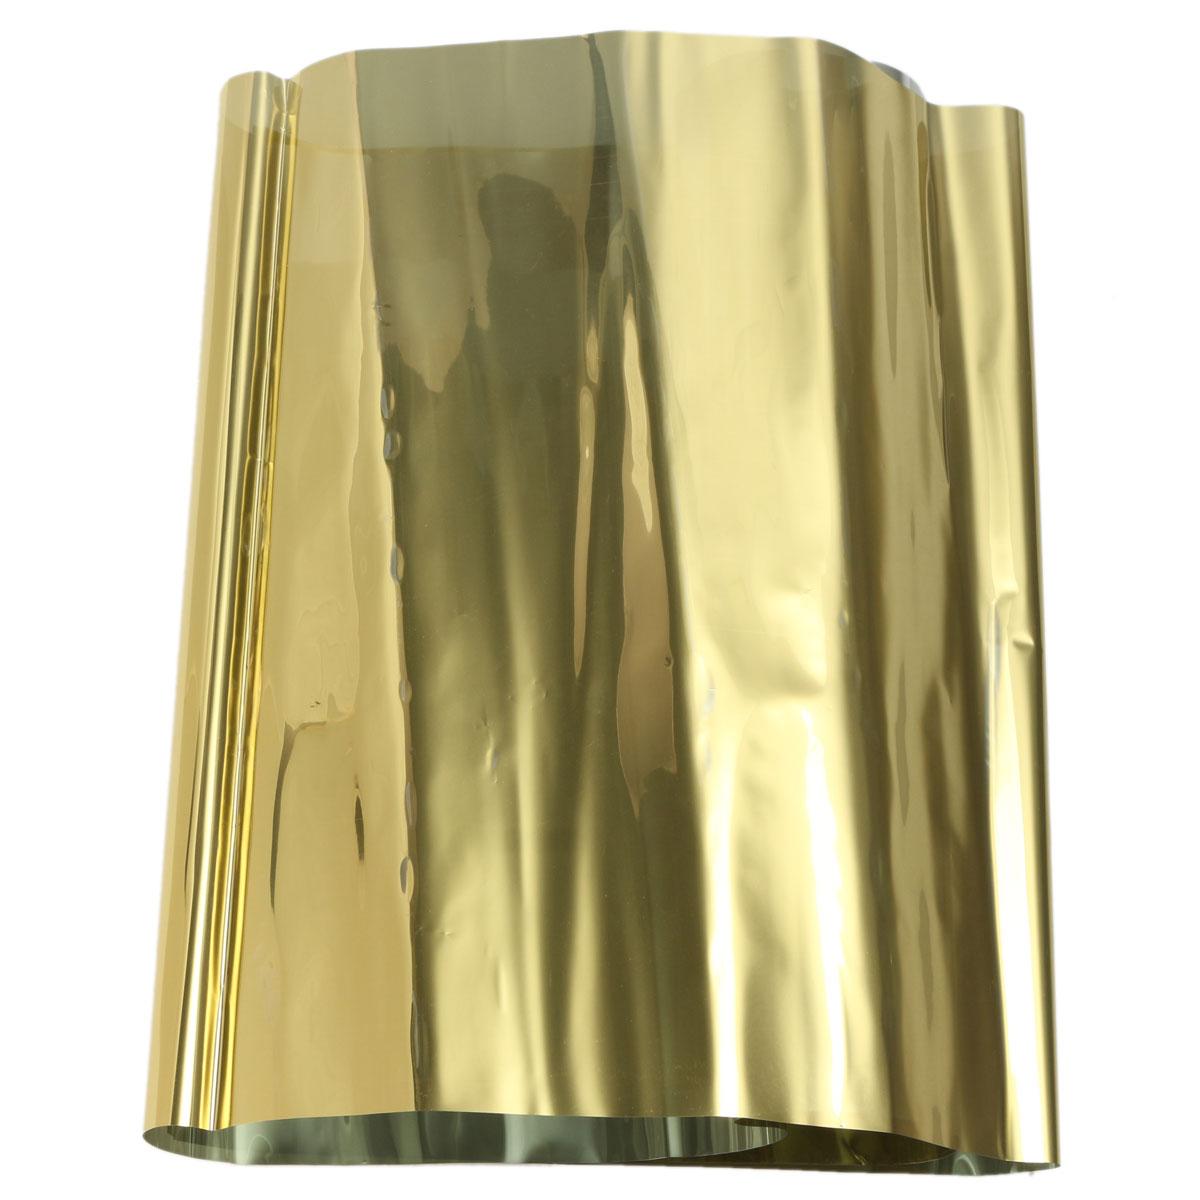 1mx30cm one way reflective mirror window film tint self for Gold window mirror